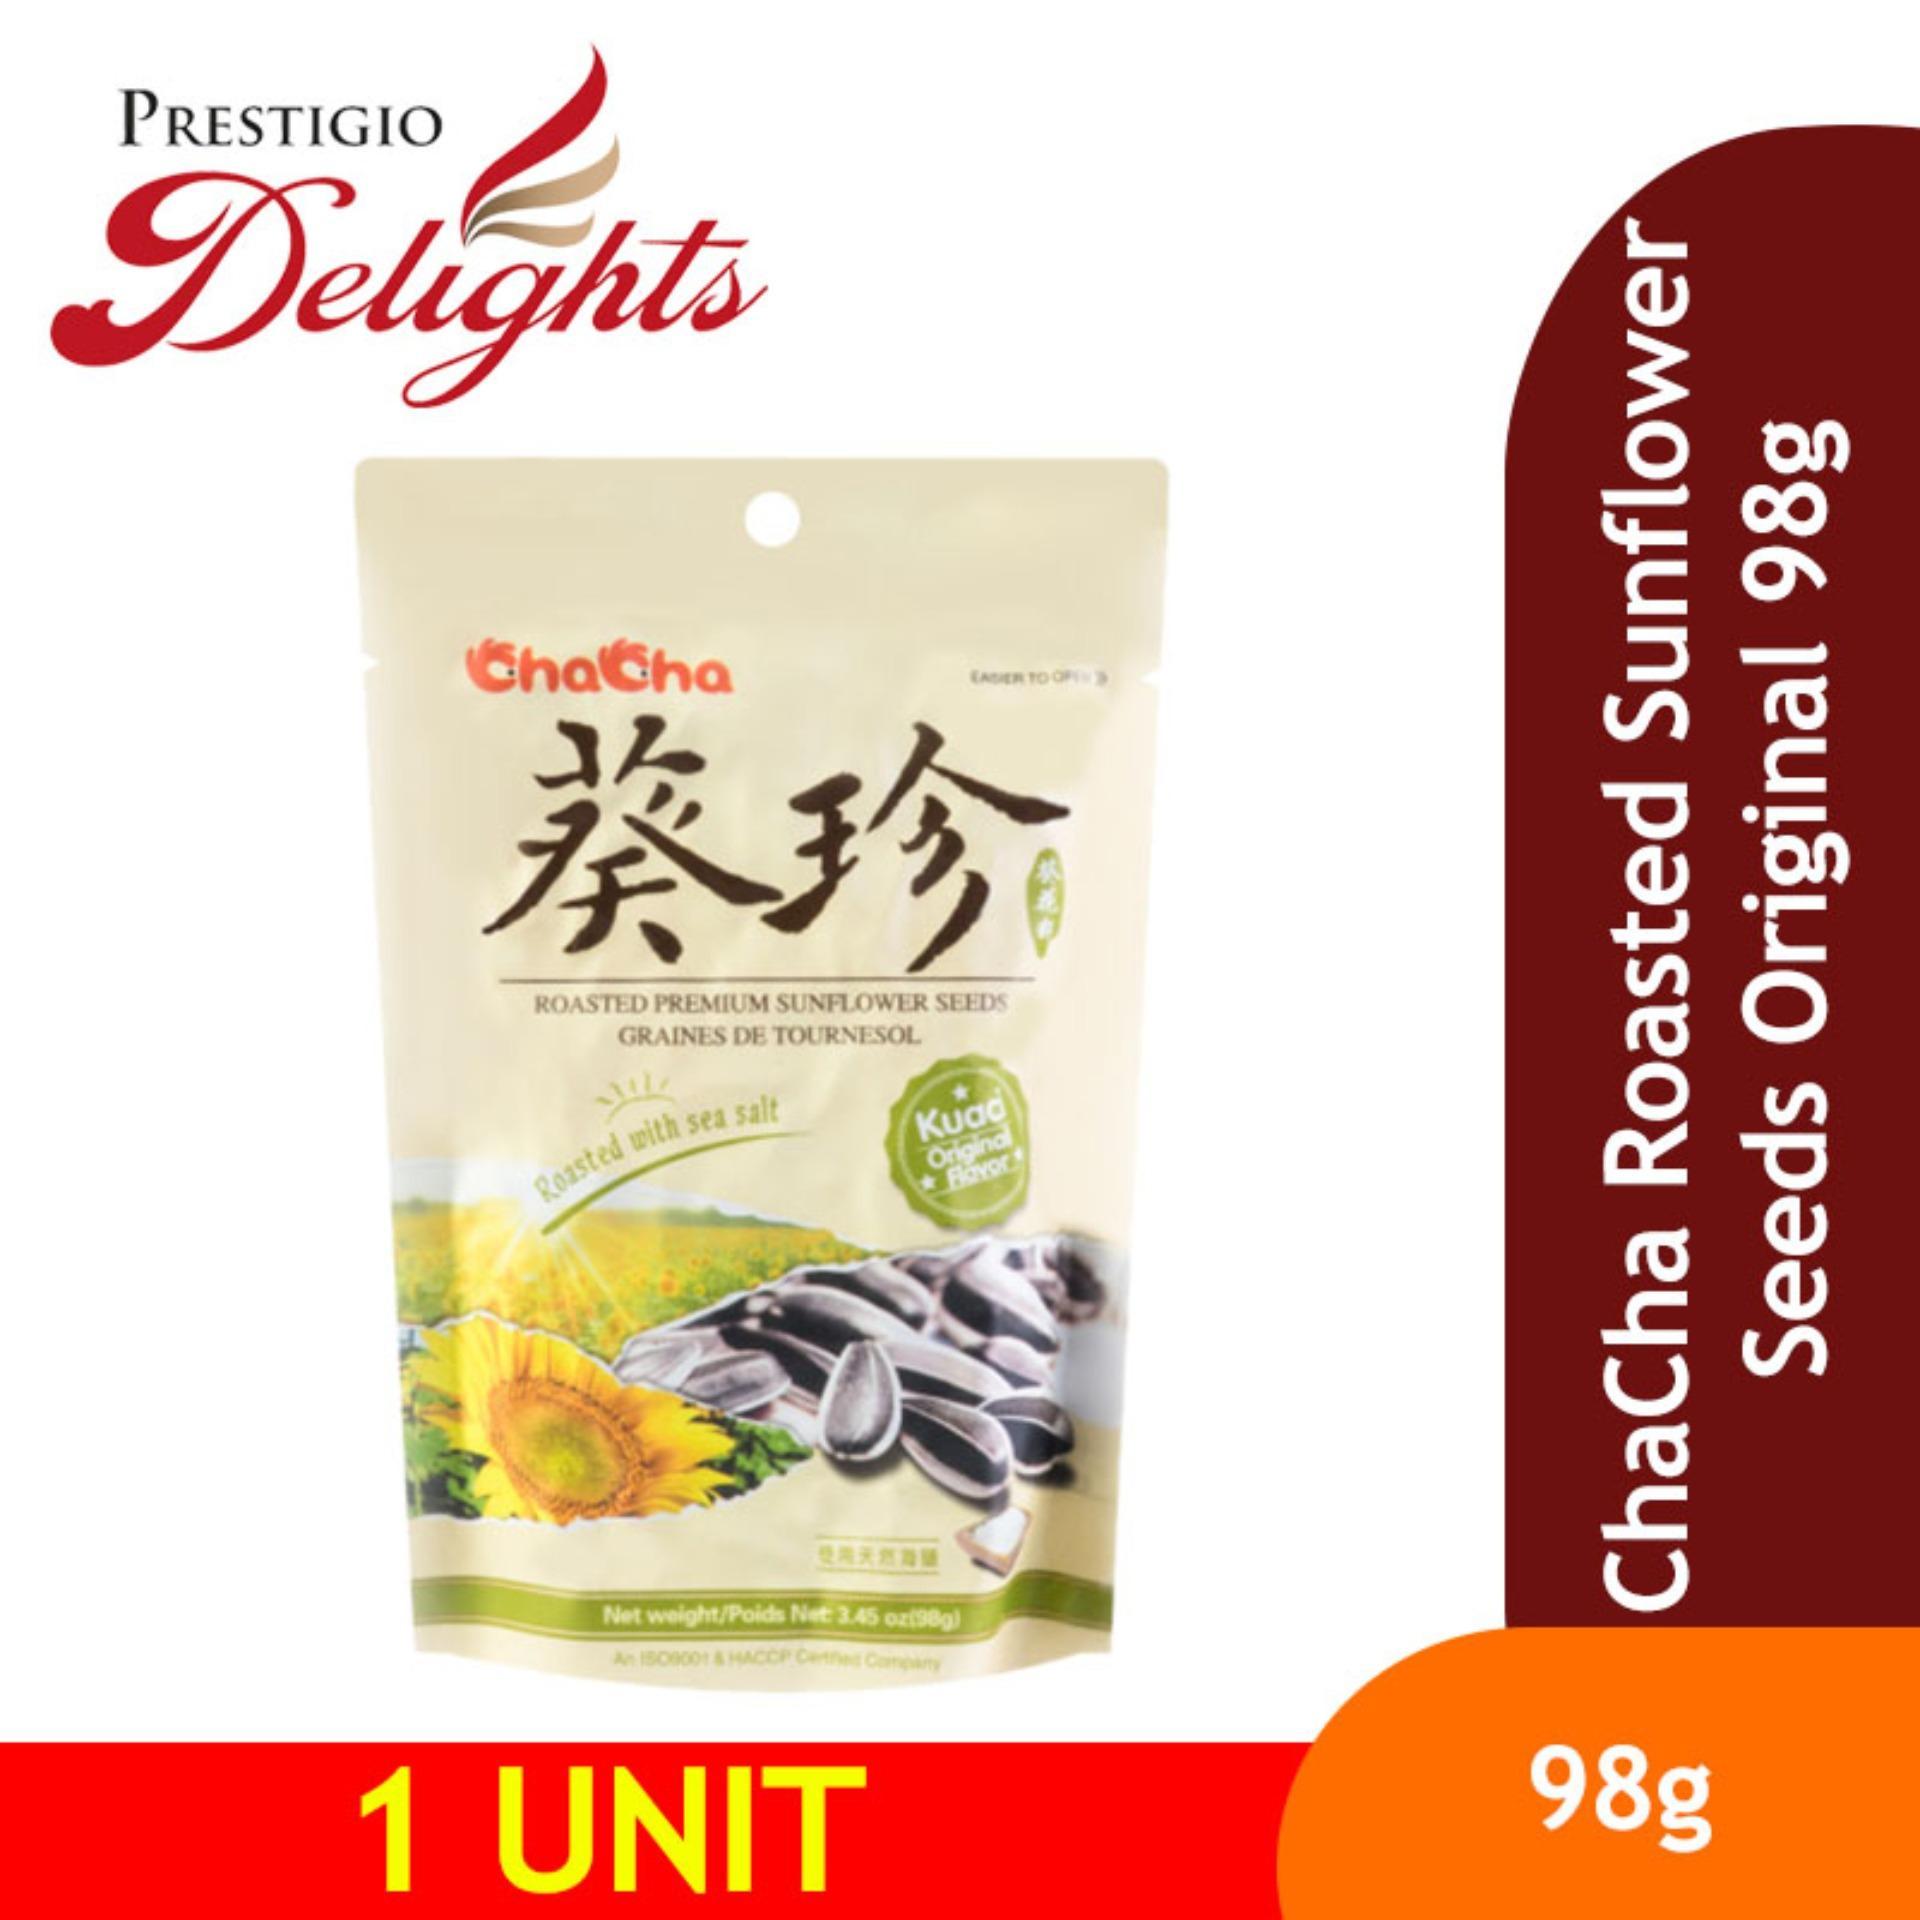 Chacha Roasted Sunflower Seeds Original 98g By Prestigio Delights.